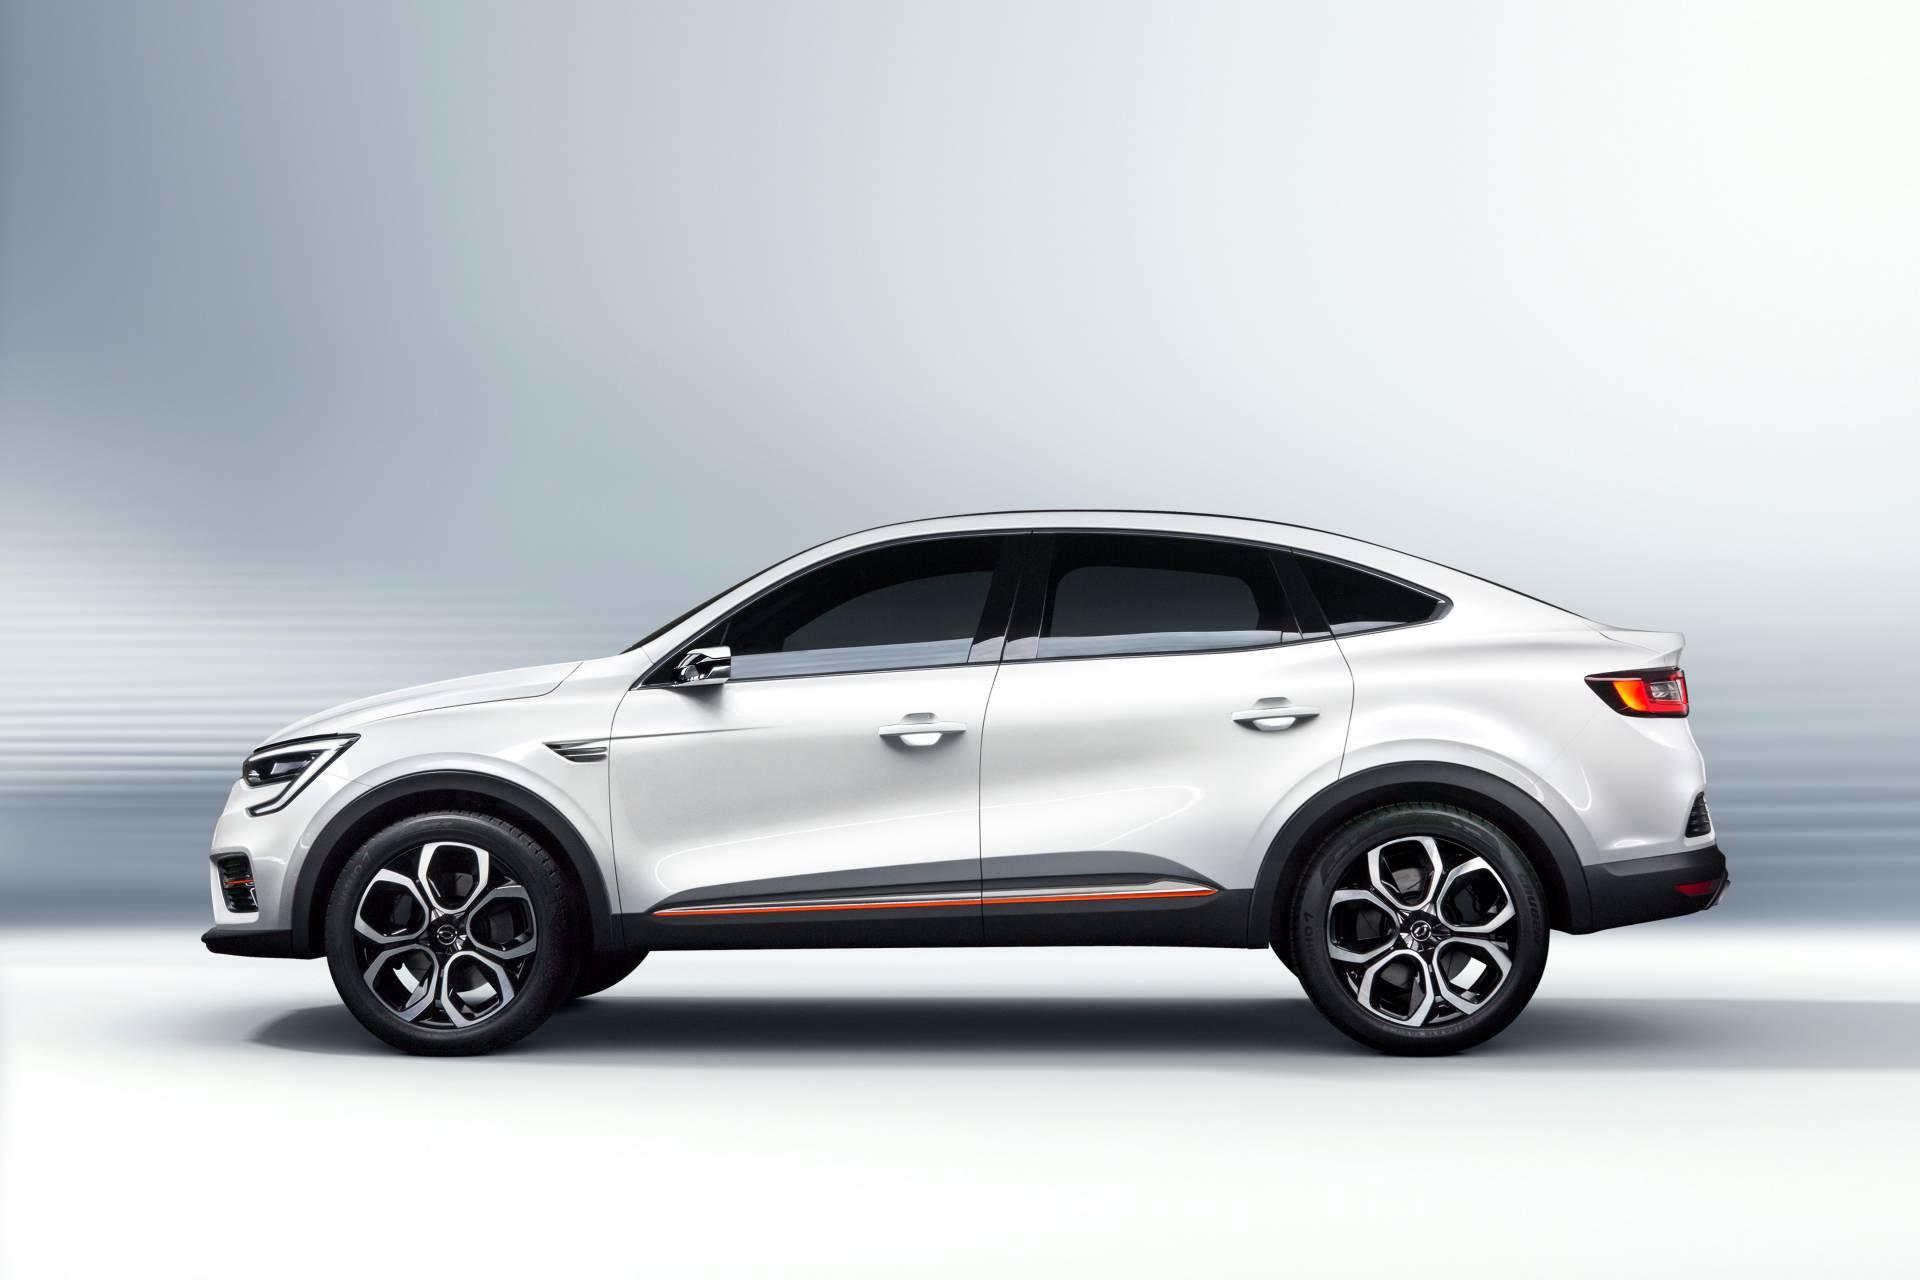 Renault-Samsung-XM3-Inspire-Concept-4